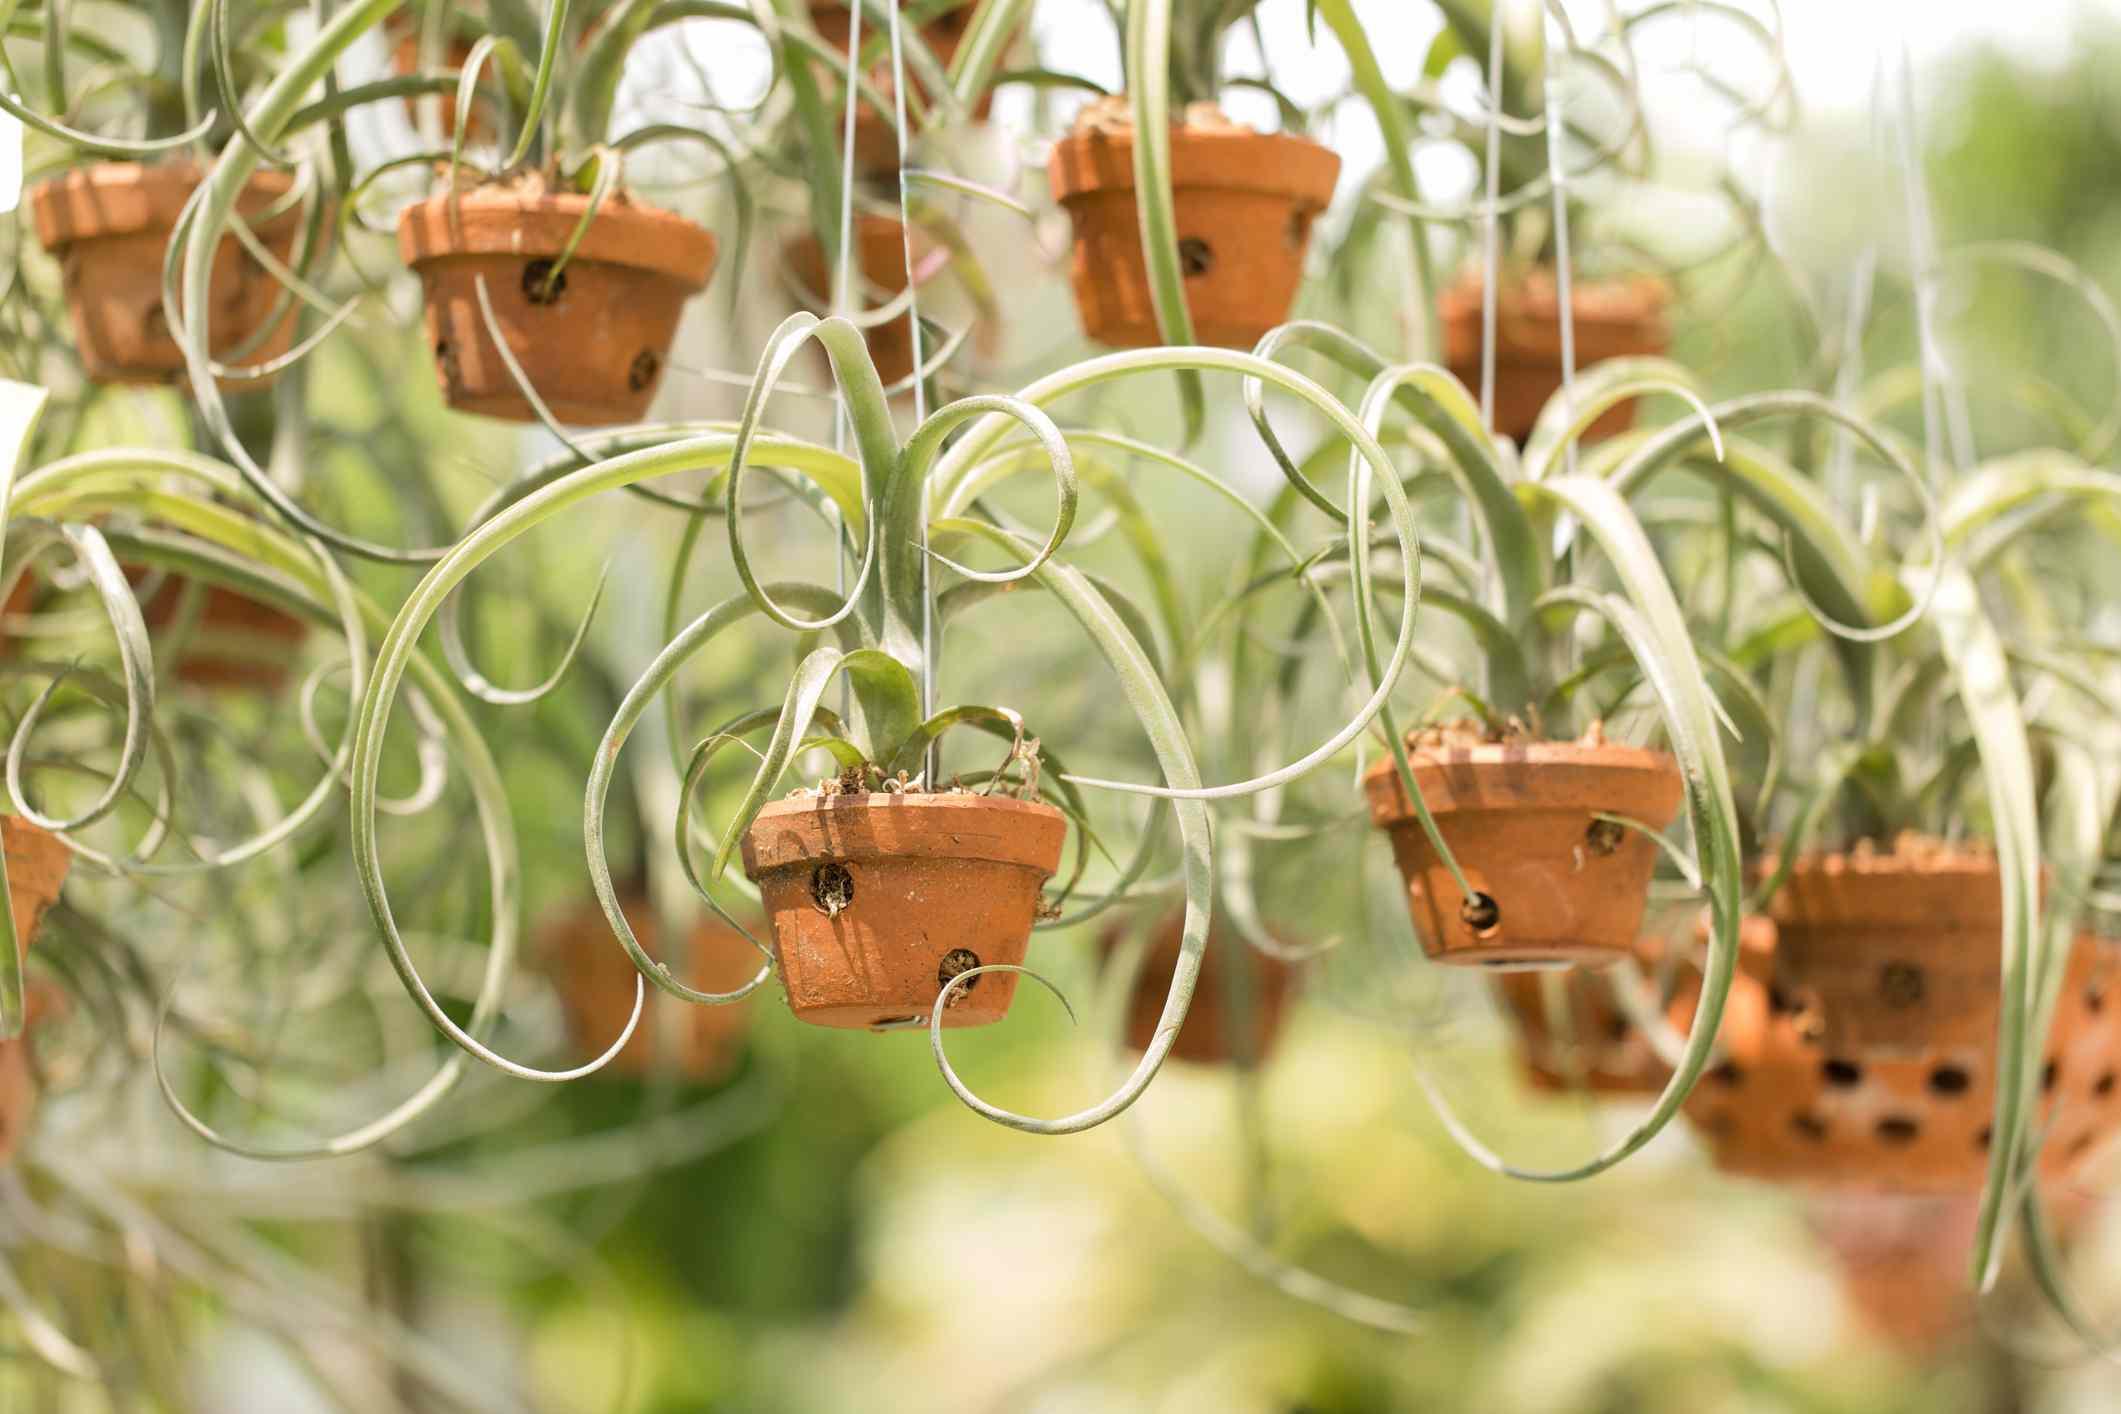 Air plants hanging on display